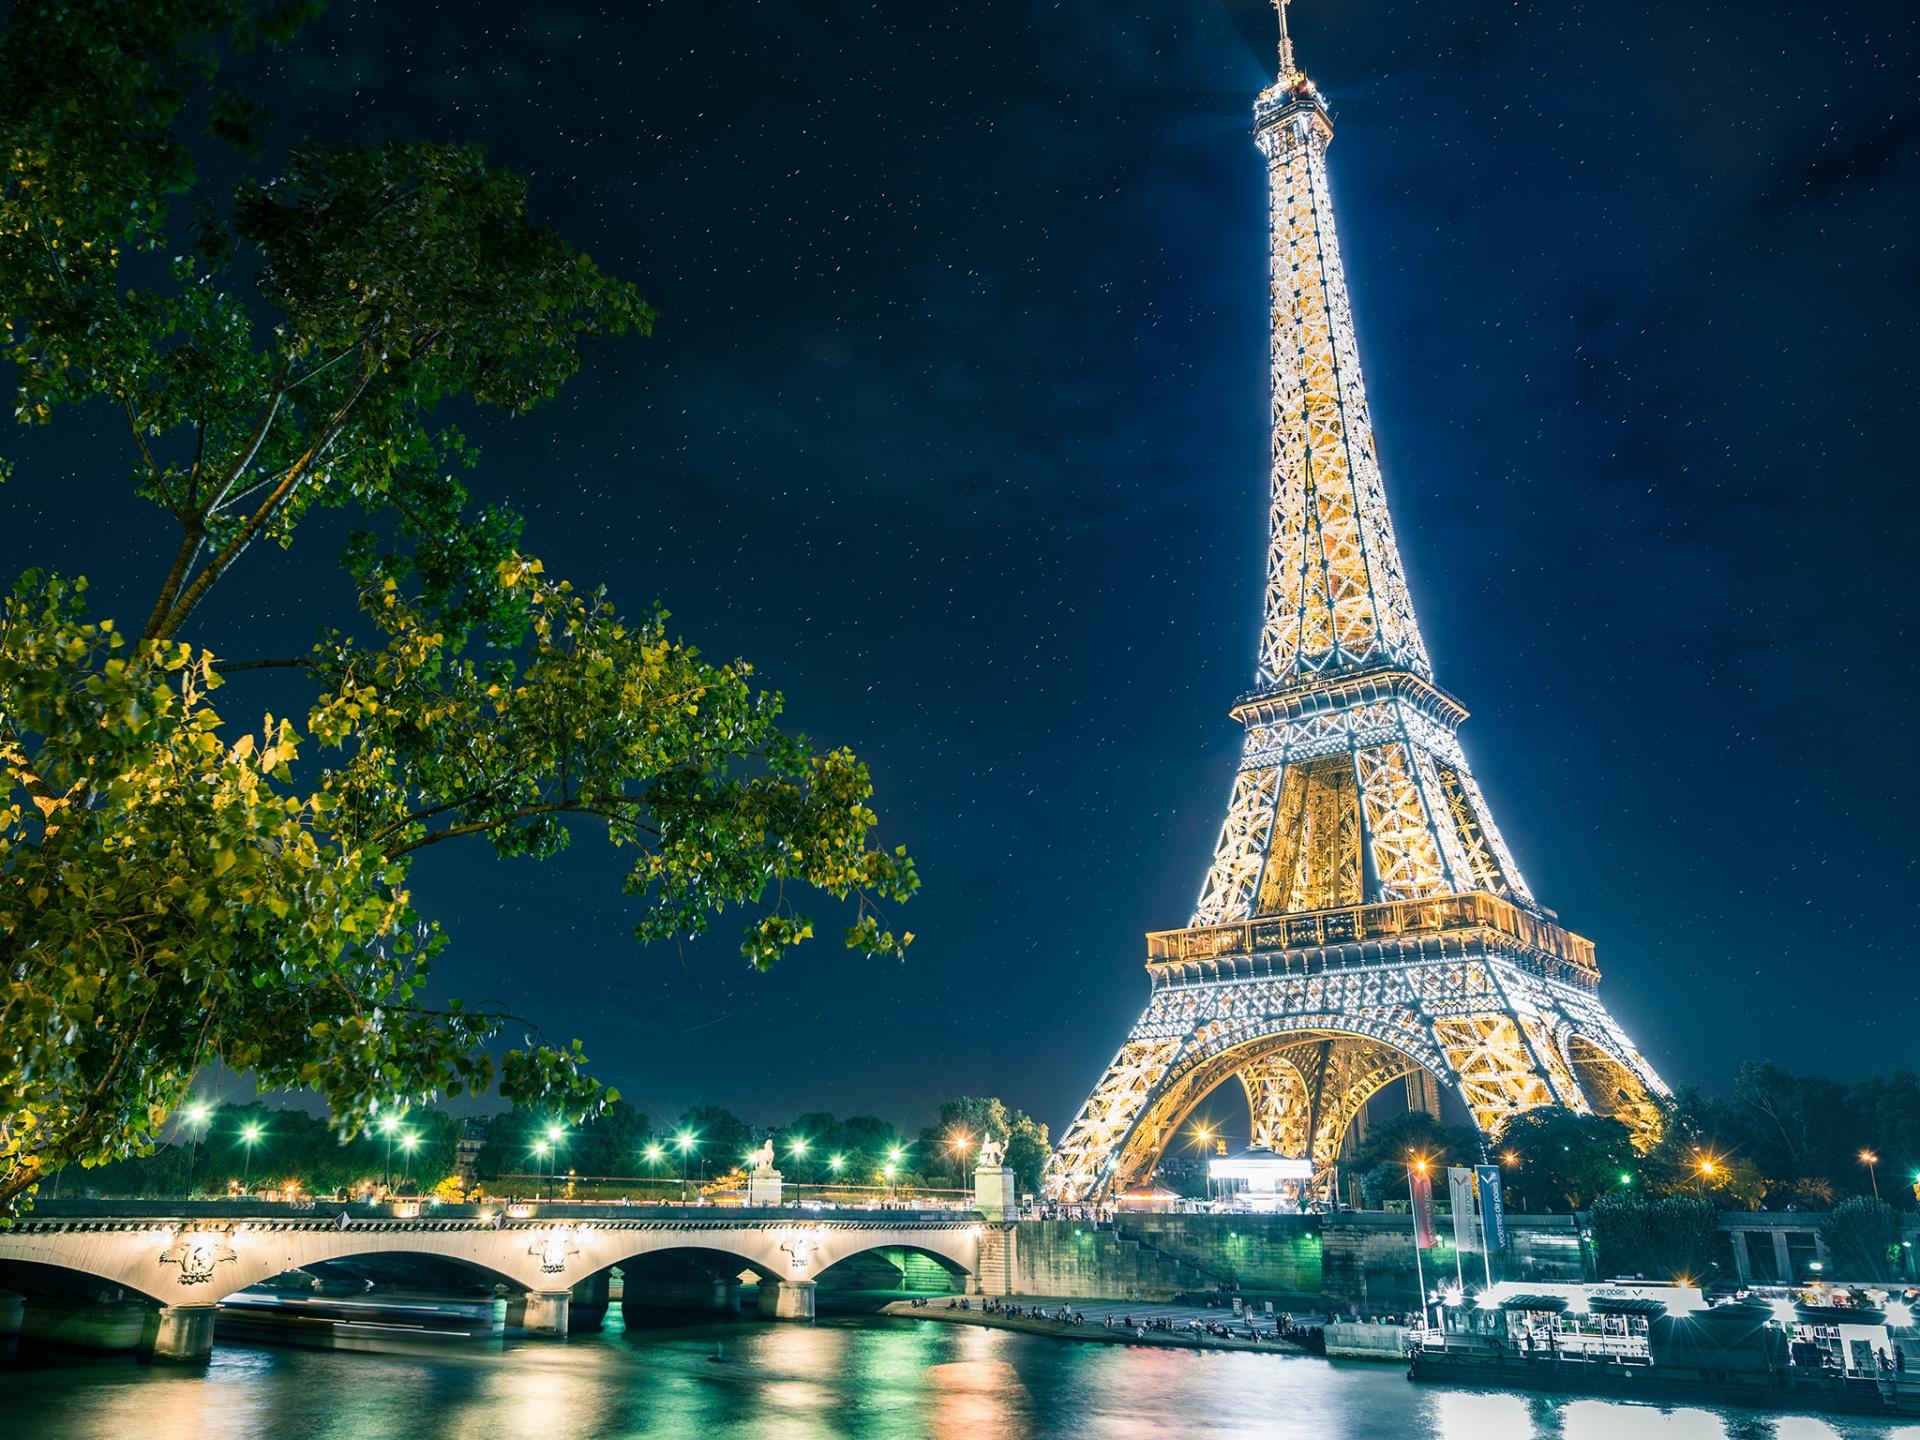 Eiffel Tower Hd Iphone Wallpaper Absn 1920x1440